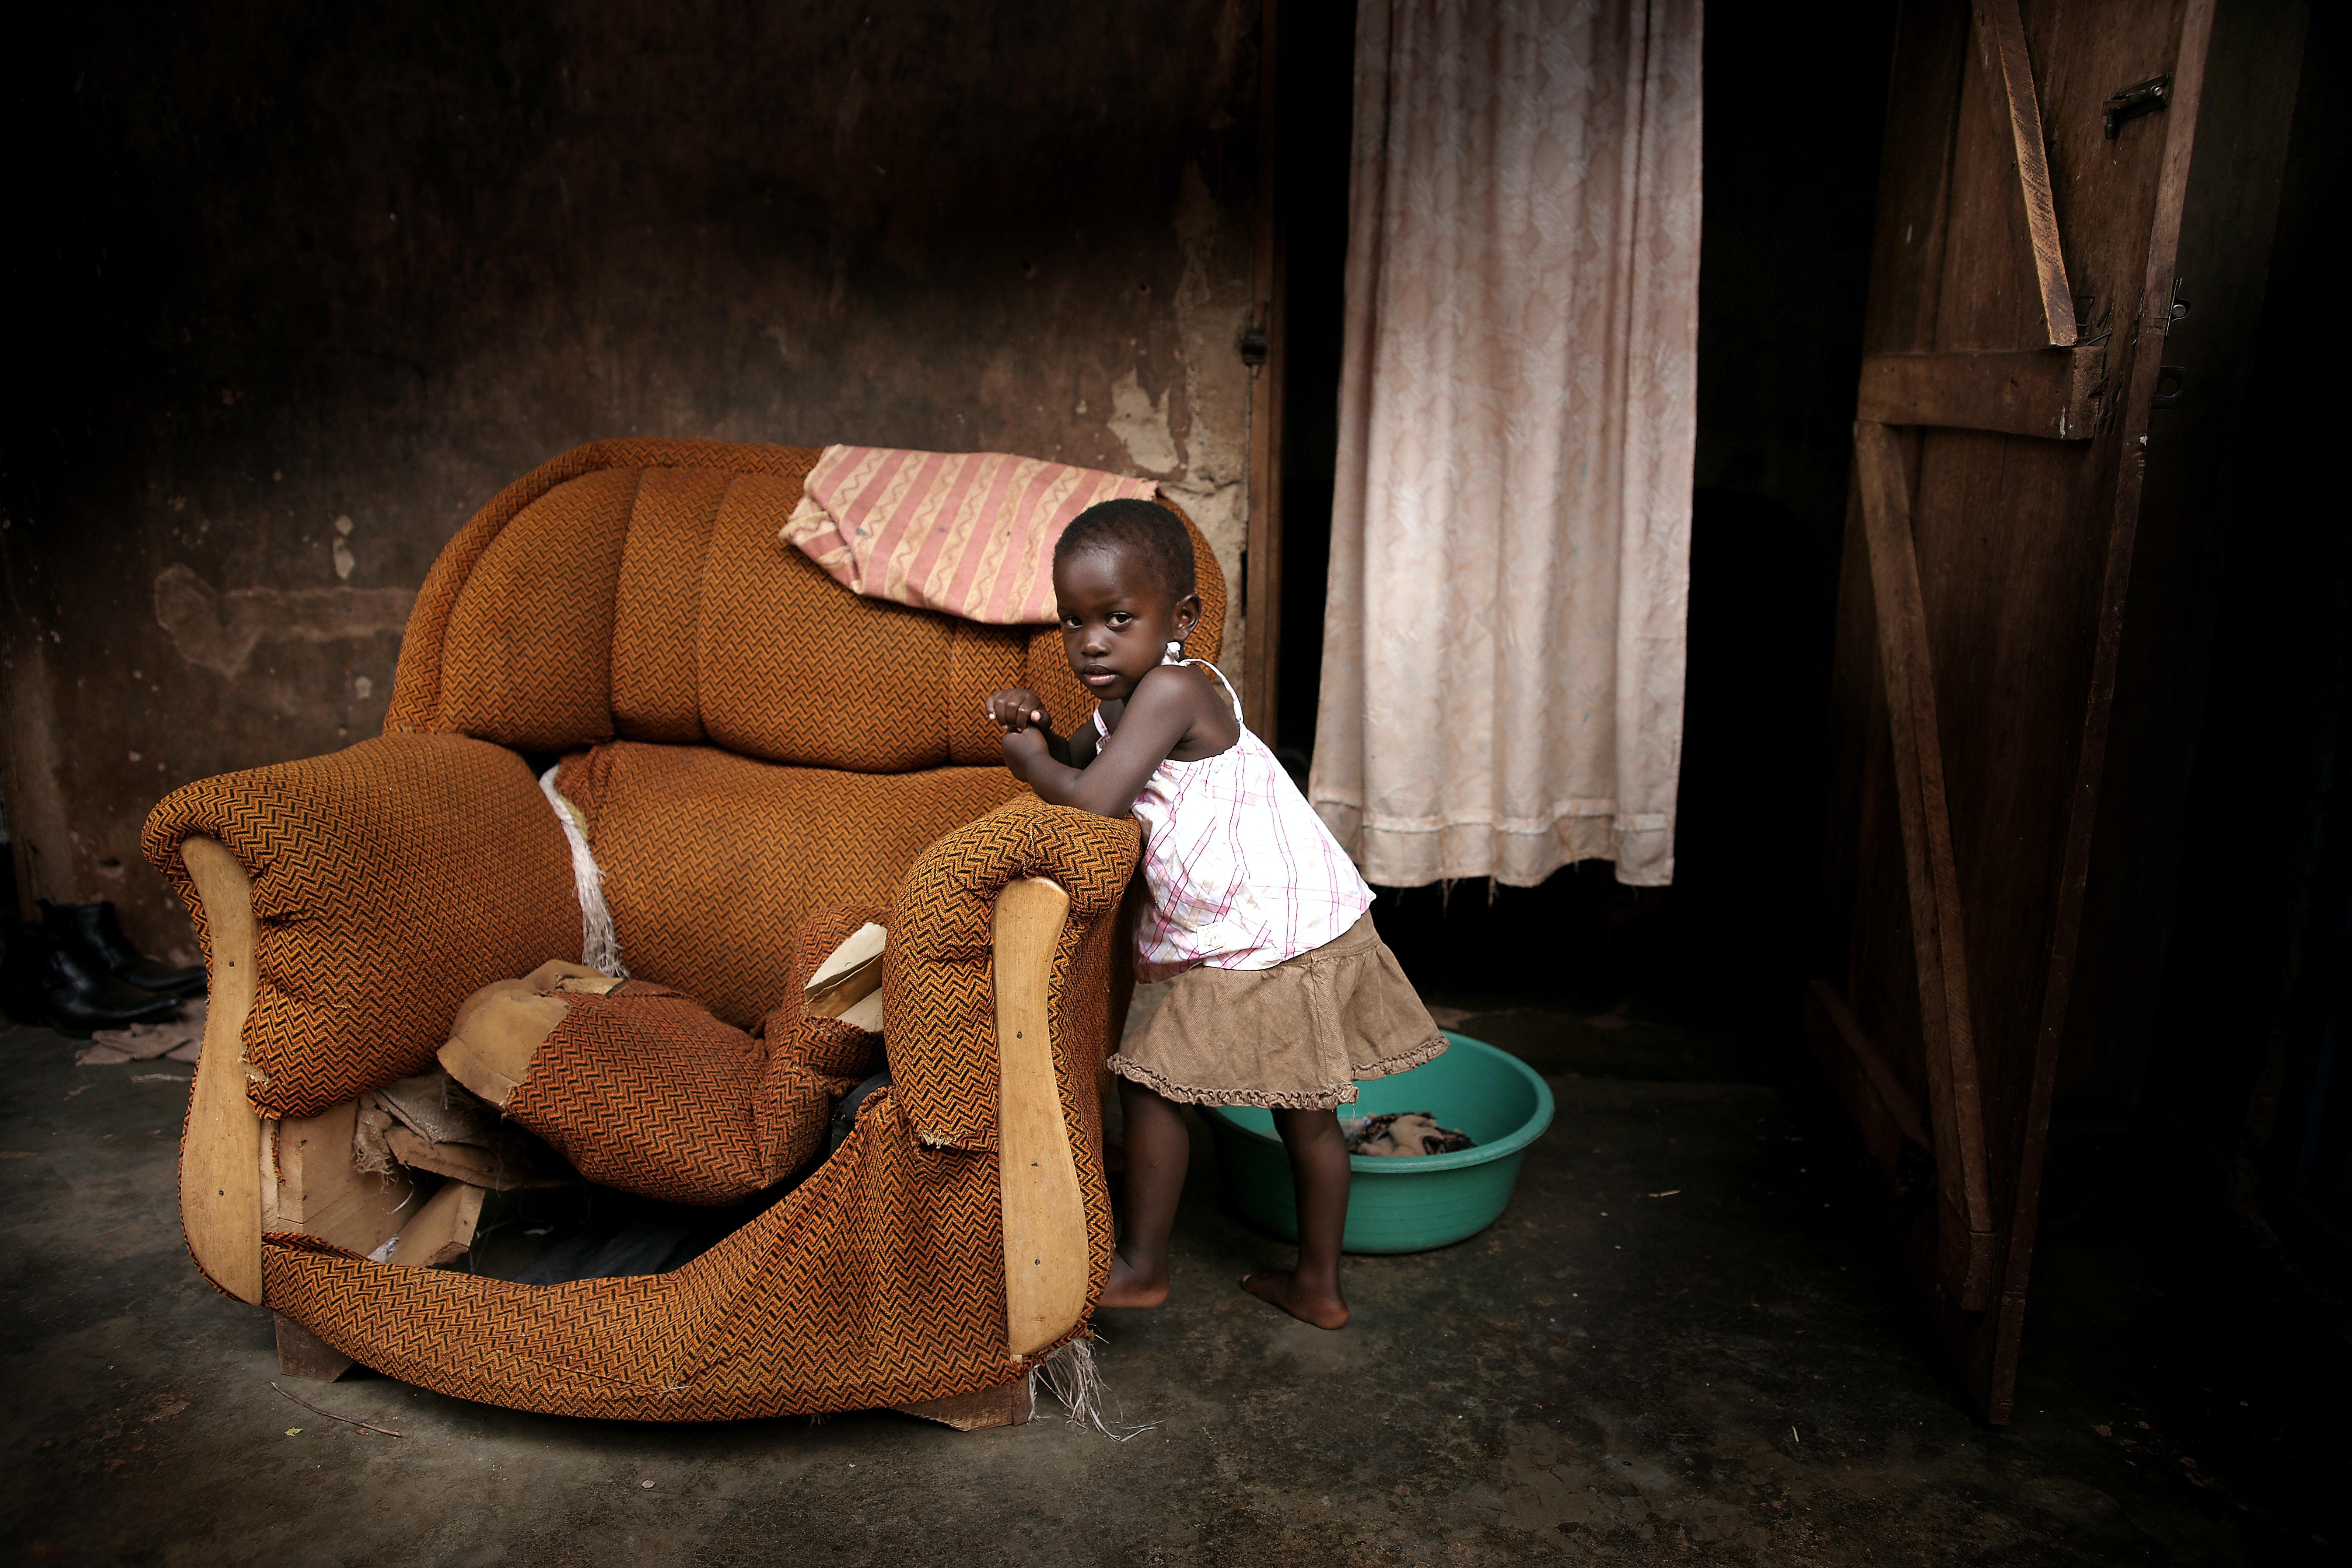 girl standing near brown fabric sofa chair inside room